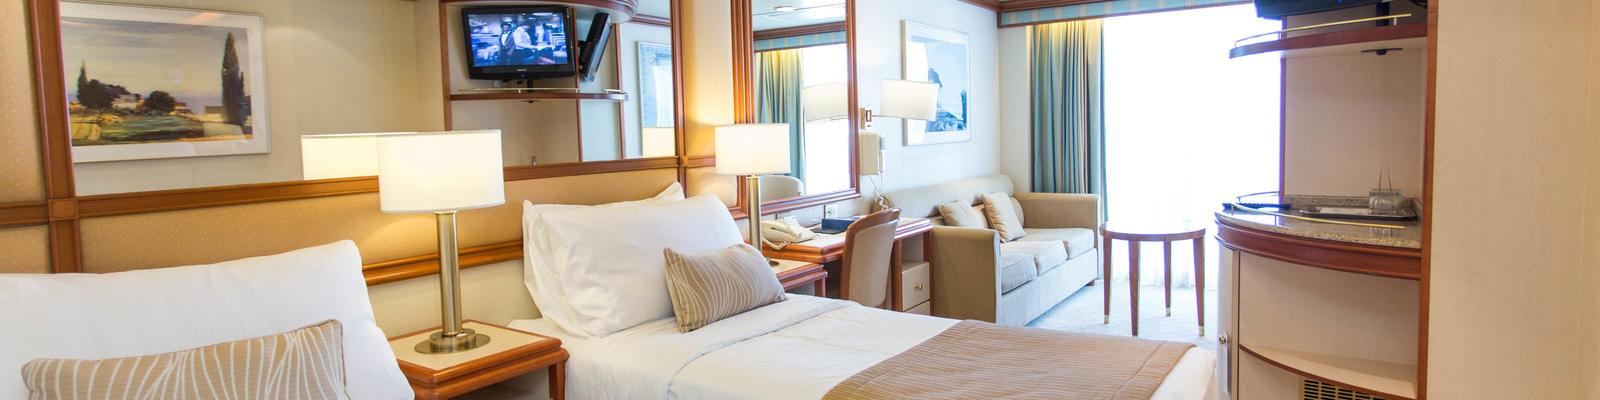 Princess Cruises Club Class Perks: 5 Amenities Worth the Splurge (Photo: Cruise Critic)